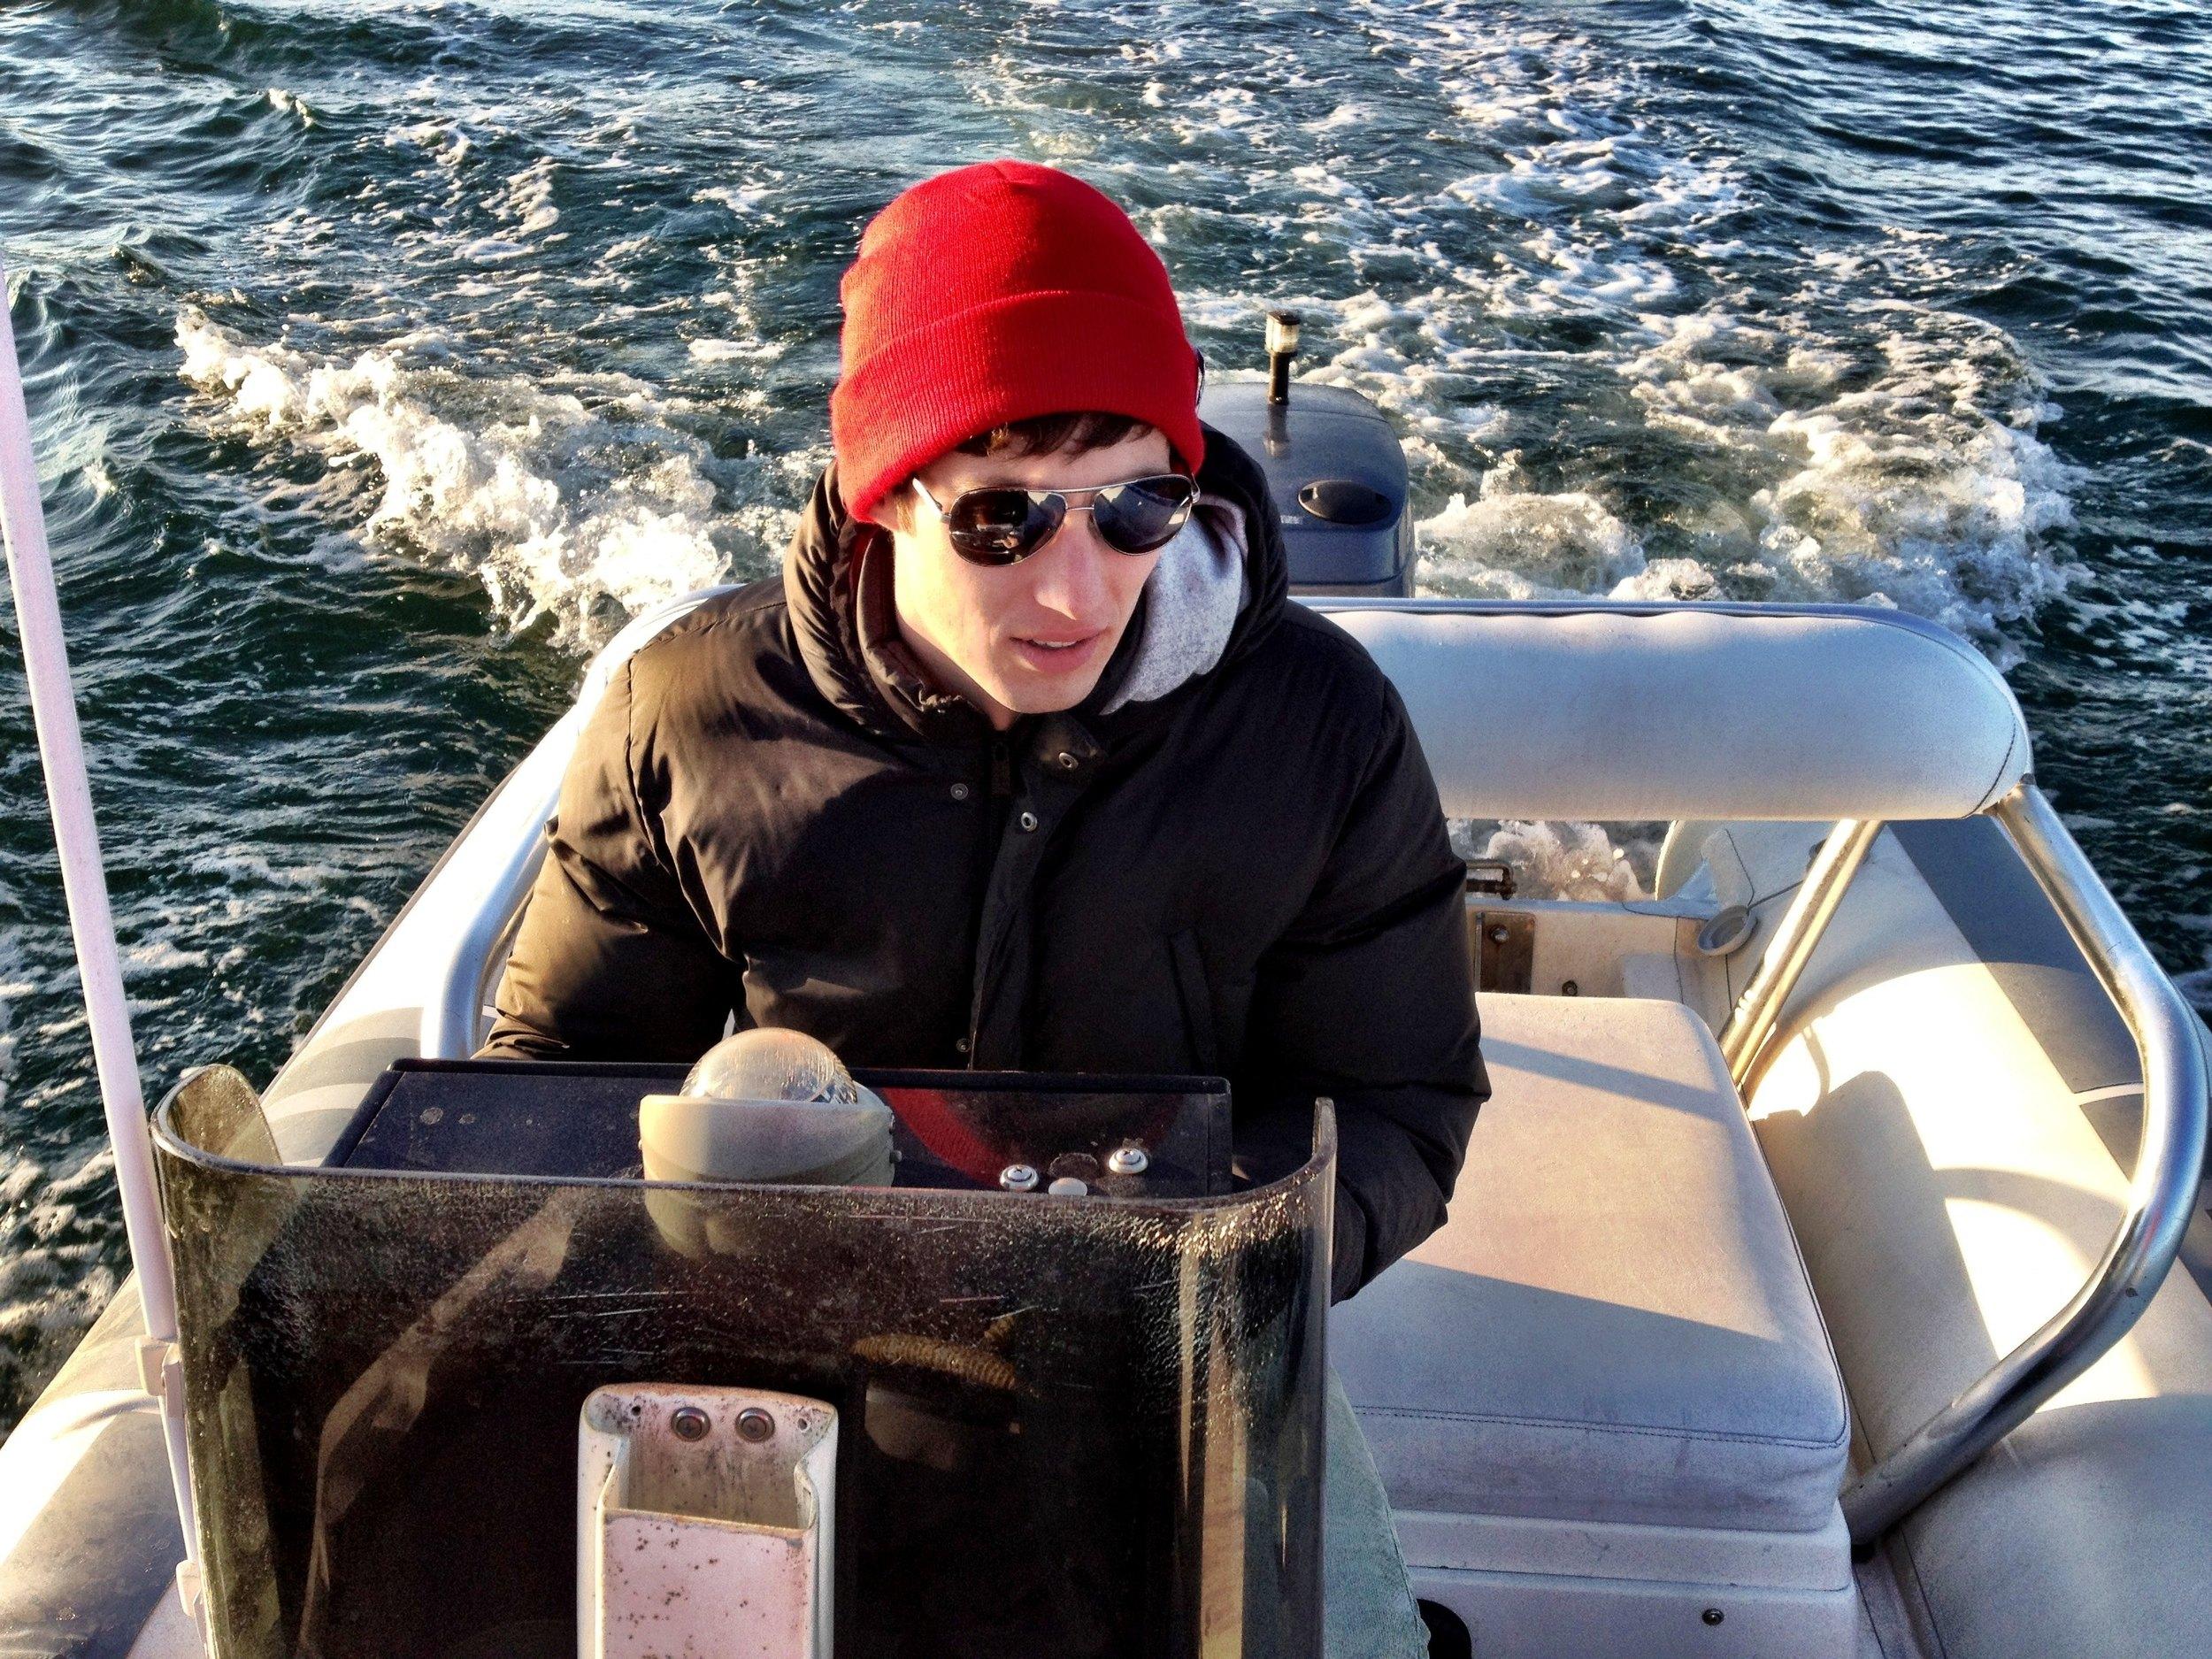 alue optics case watson boat aviator